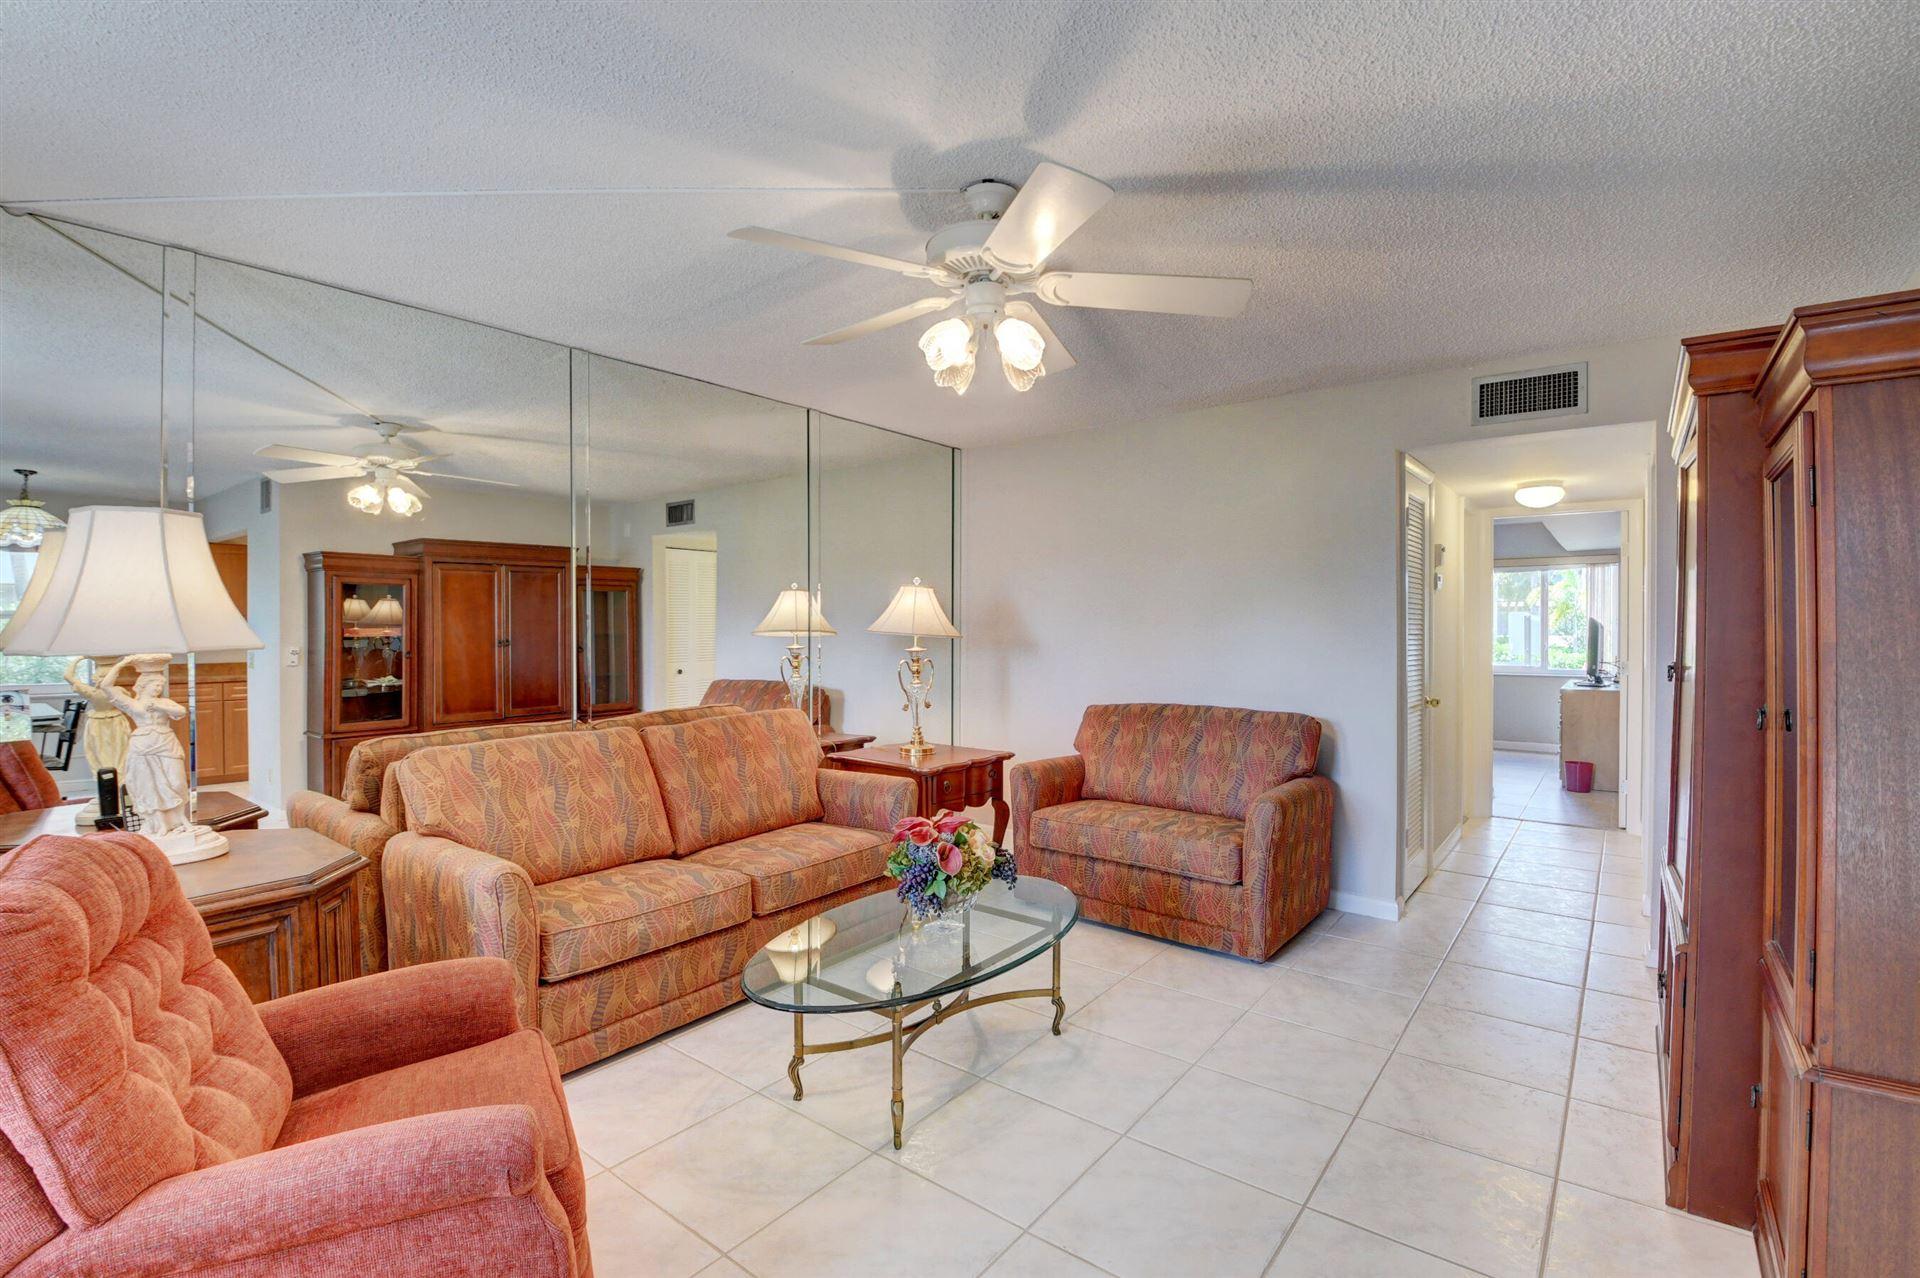 547 Piedmont L, Delray Beach, FL 33484 - MLS#: RX-10712065